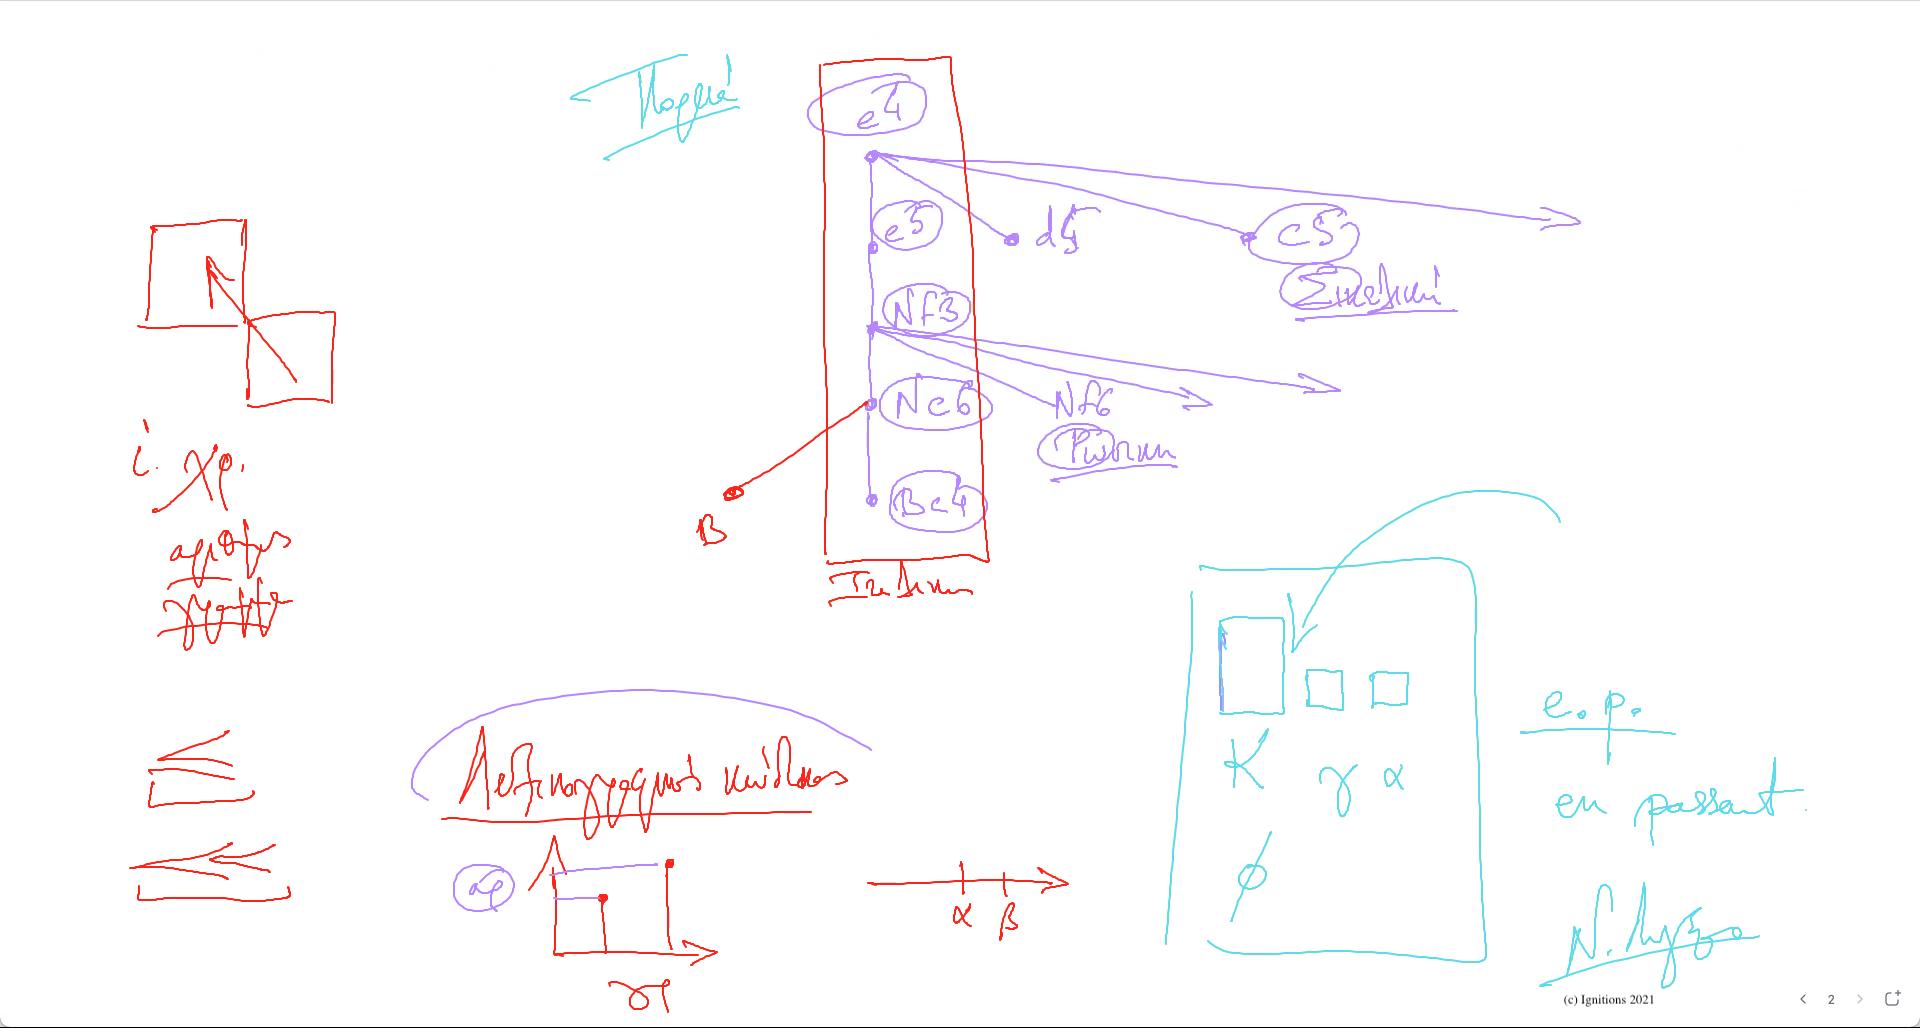 57812 - e-Μάθημα II: Ημιανοιχτάανοίγματα και μοτίβα. (Dessin)